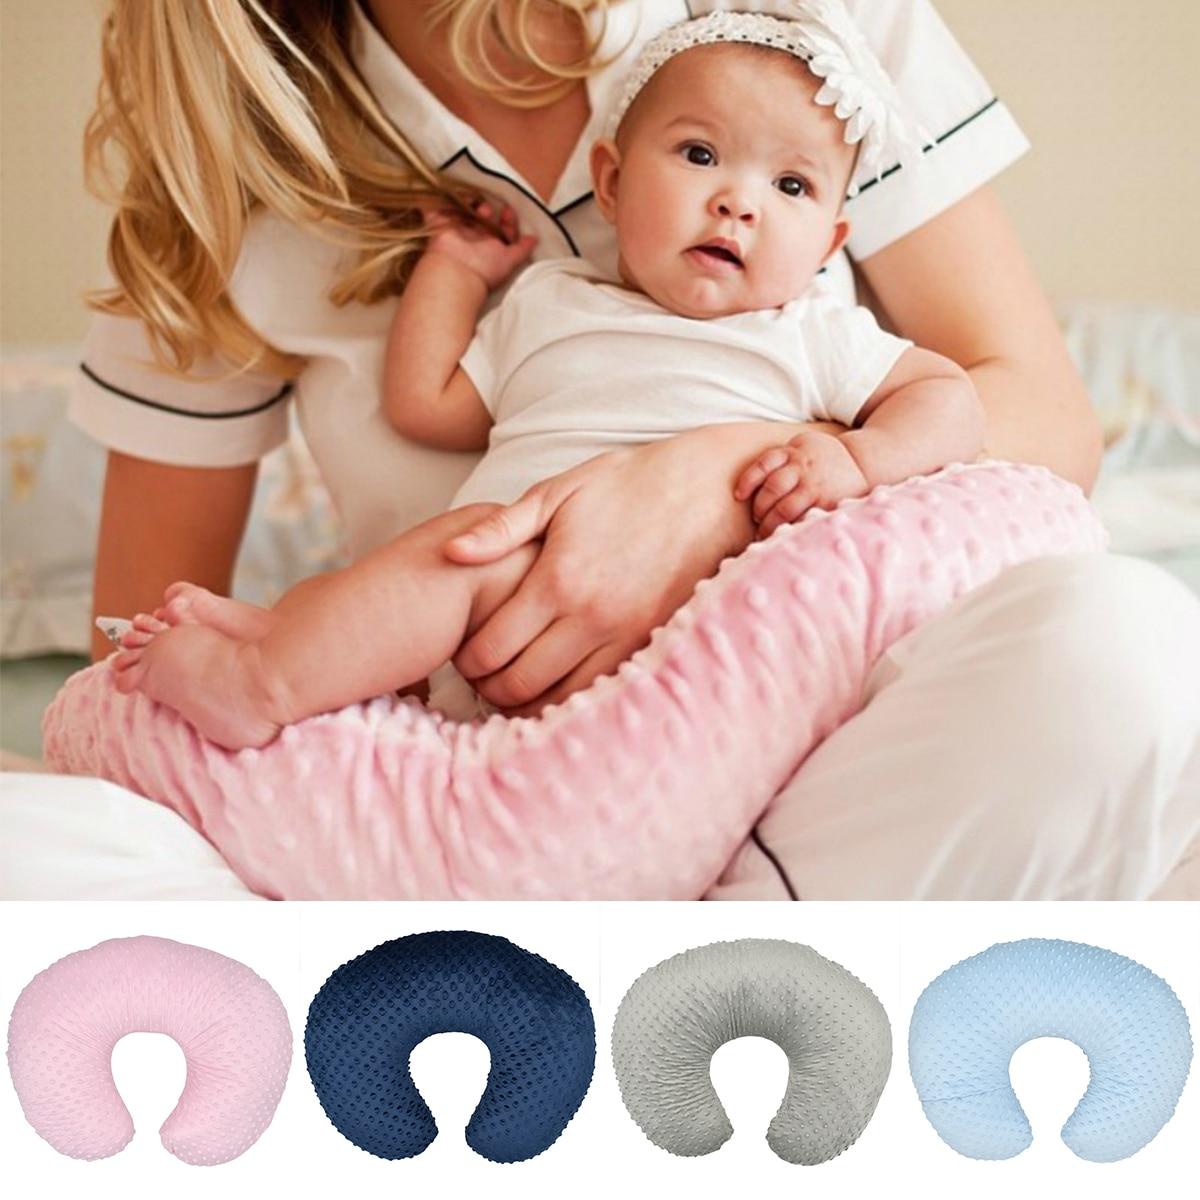 Memory Coral Fleece Pillow Neck U-Shape U Shaped Headrest Car Flight Travel Soft Nursing Cushion Baby Pillow